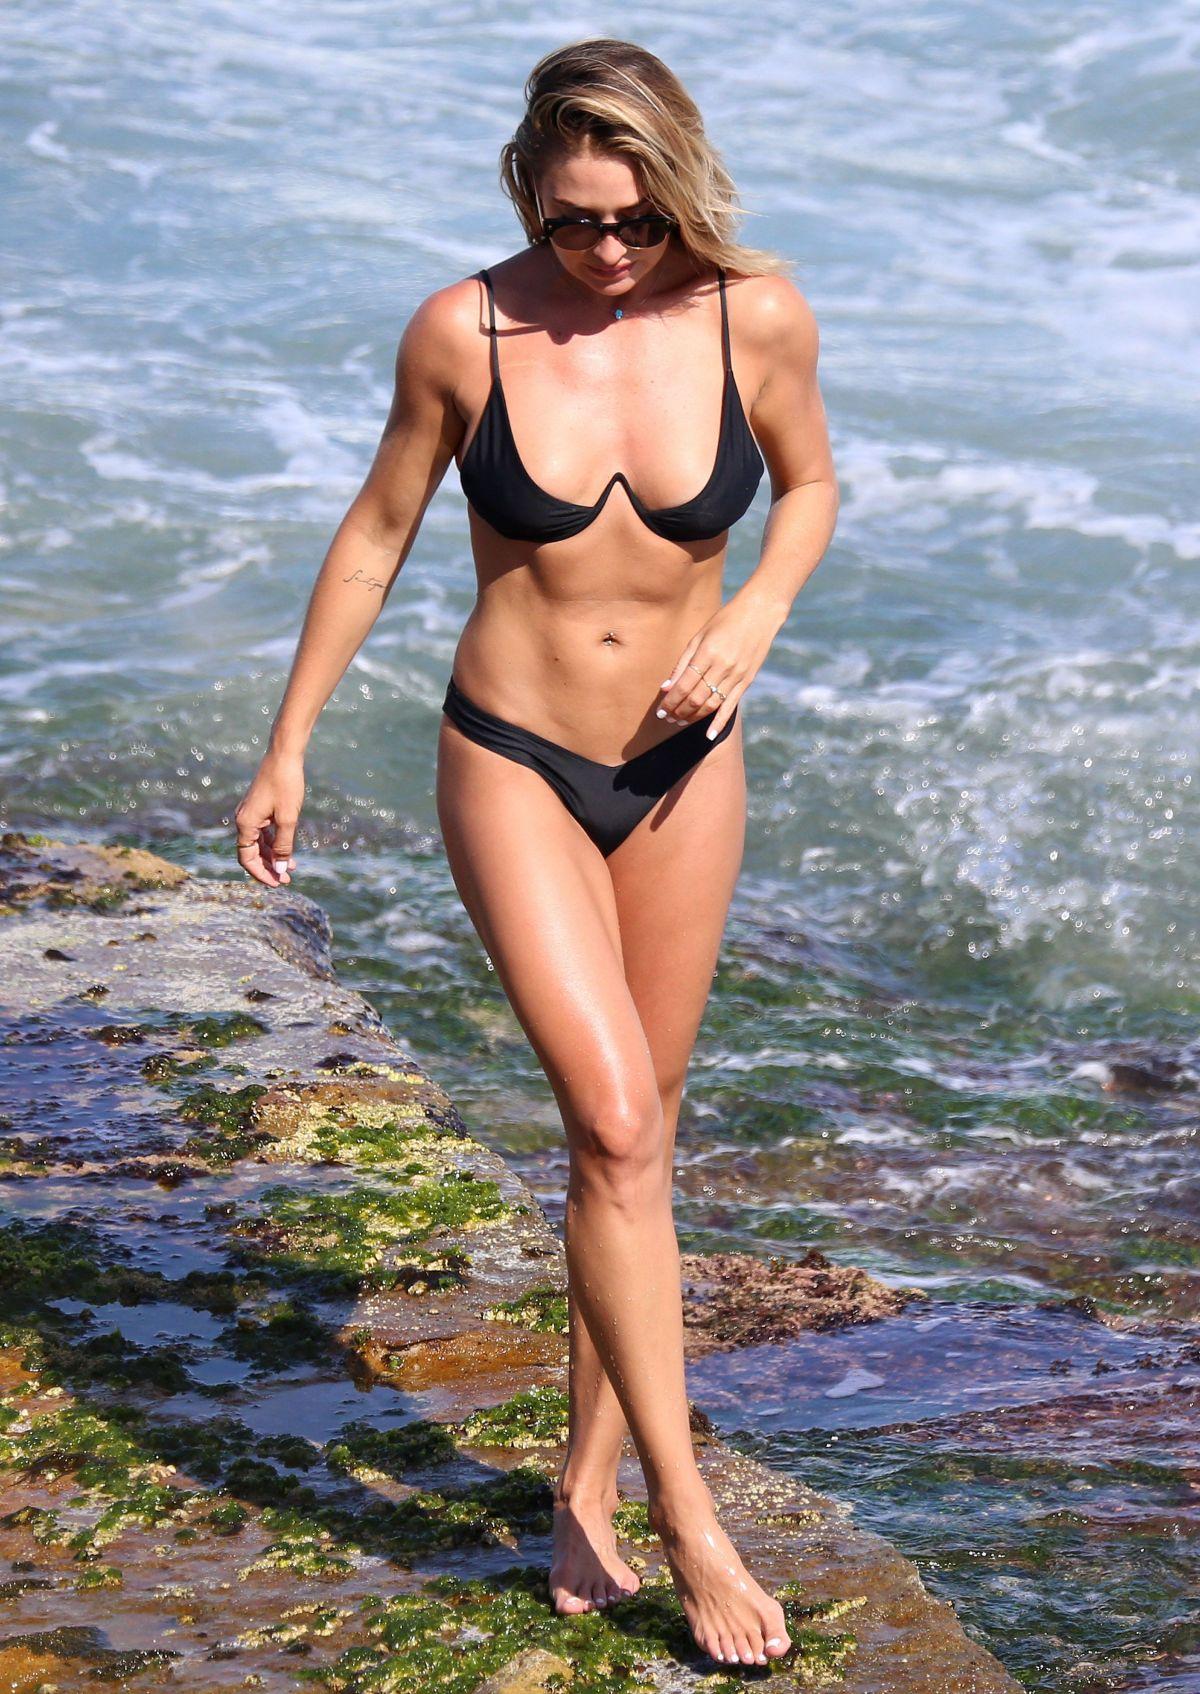 Teresa clark bikini pics — 7